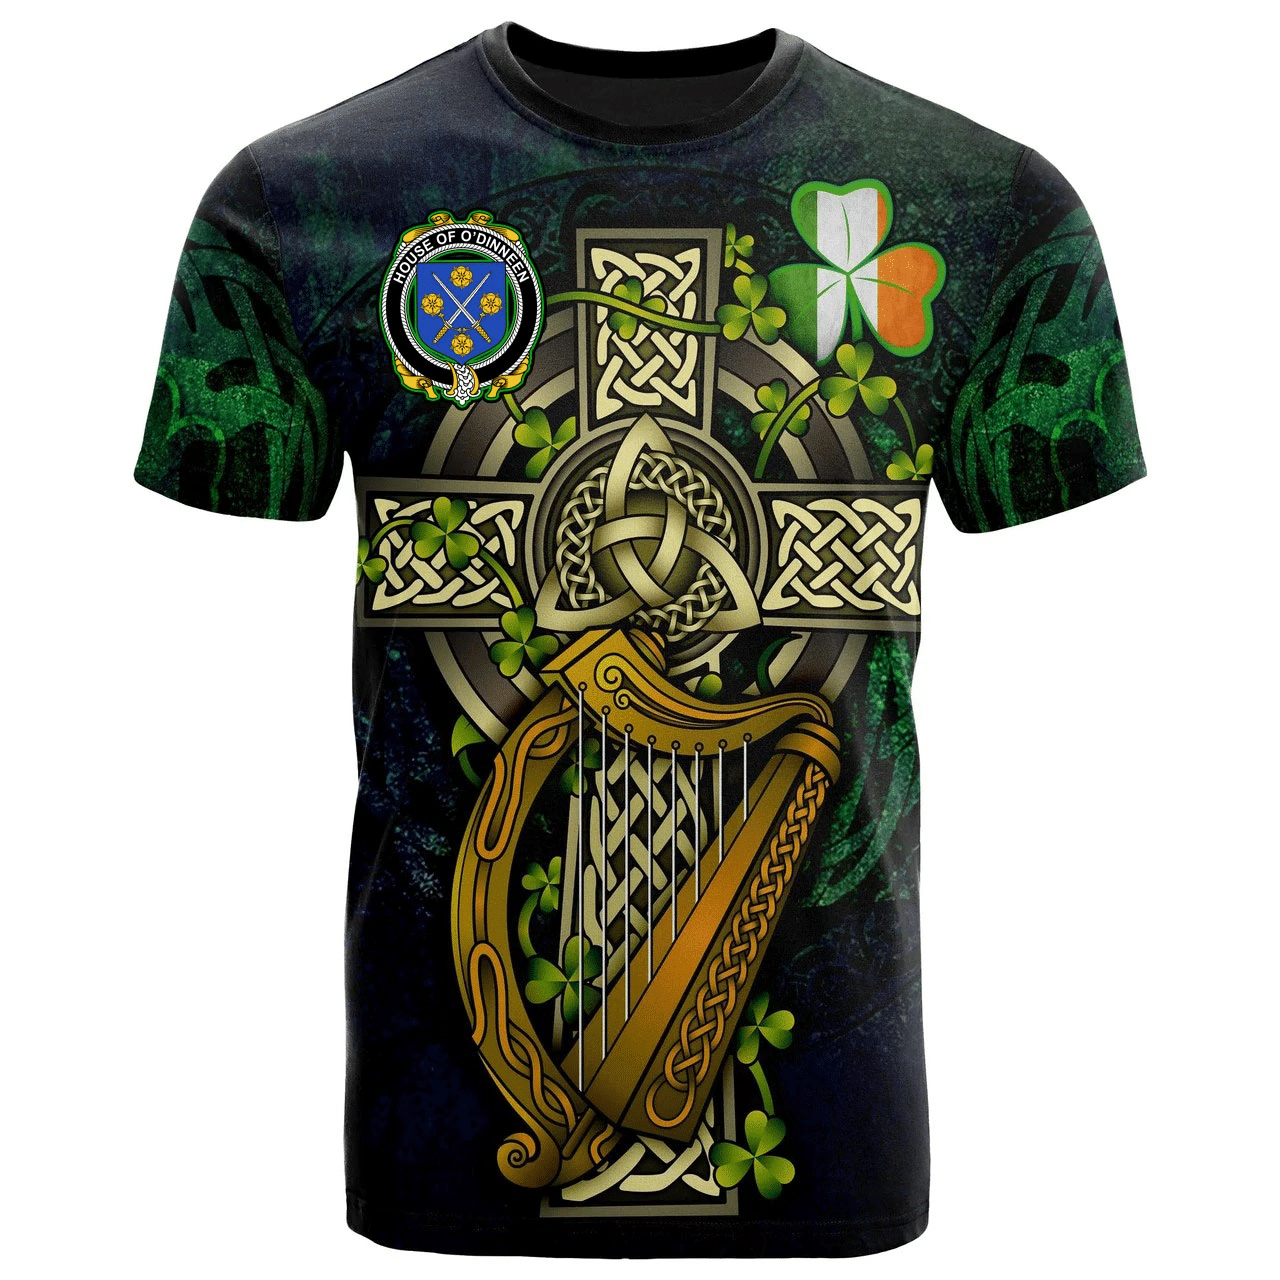 1sttheworld Ireland T-Shirt - House of O'DINNEEN Irish Family Crest and Celtic Cross A7